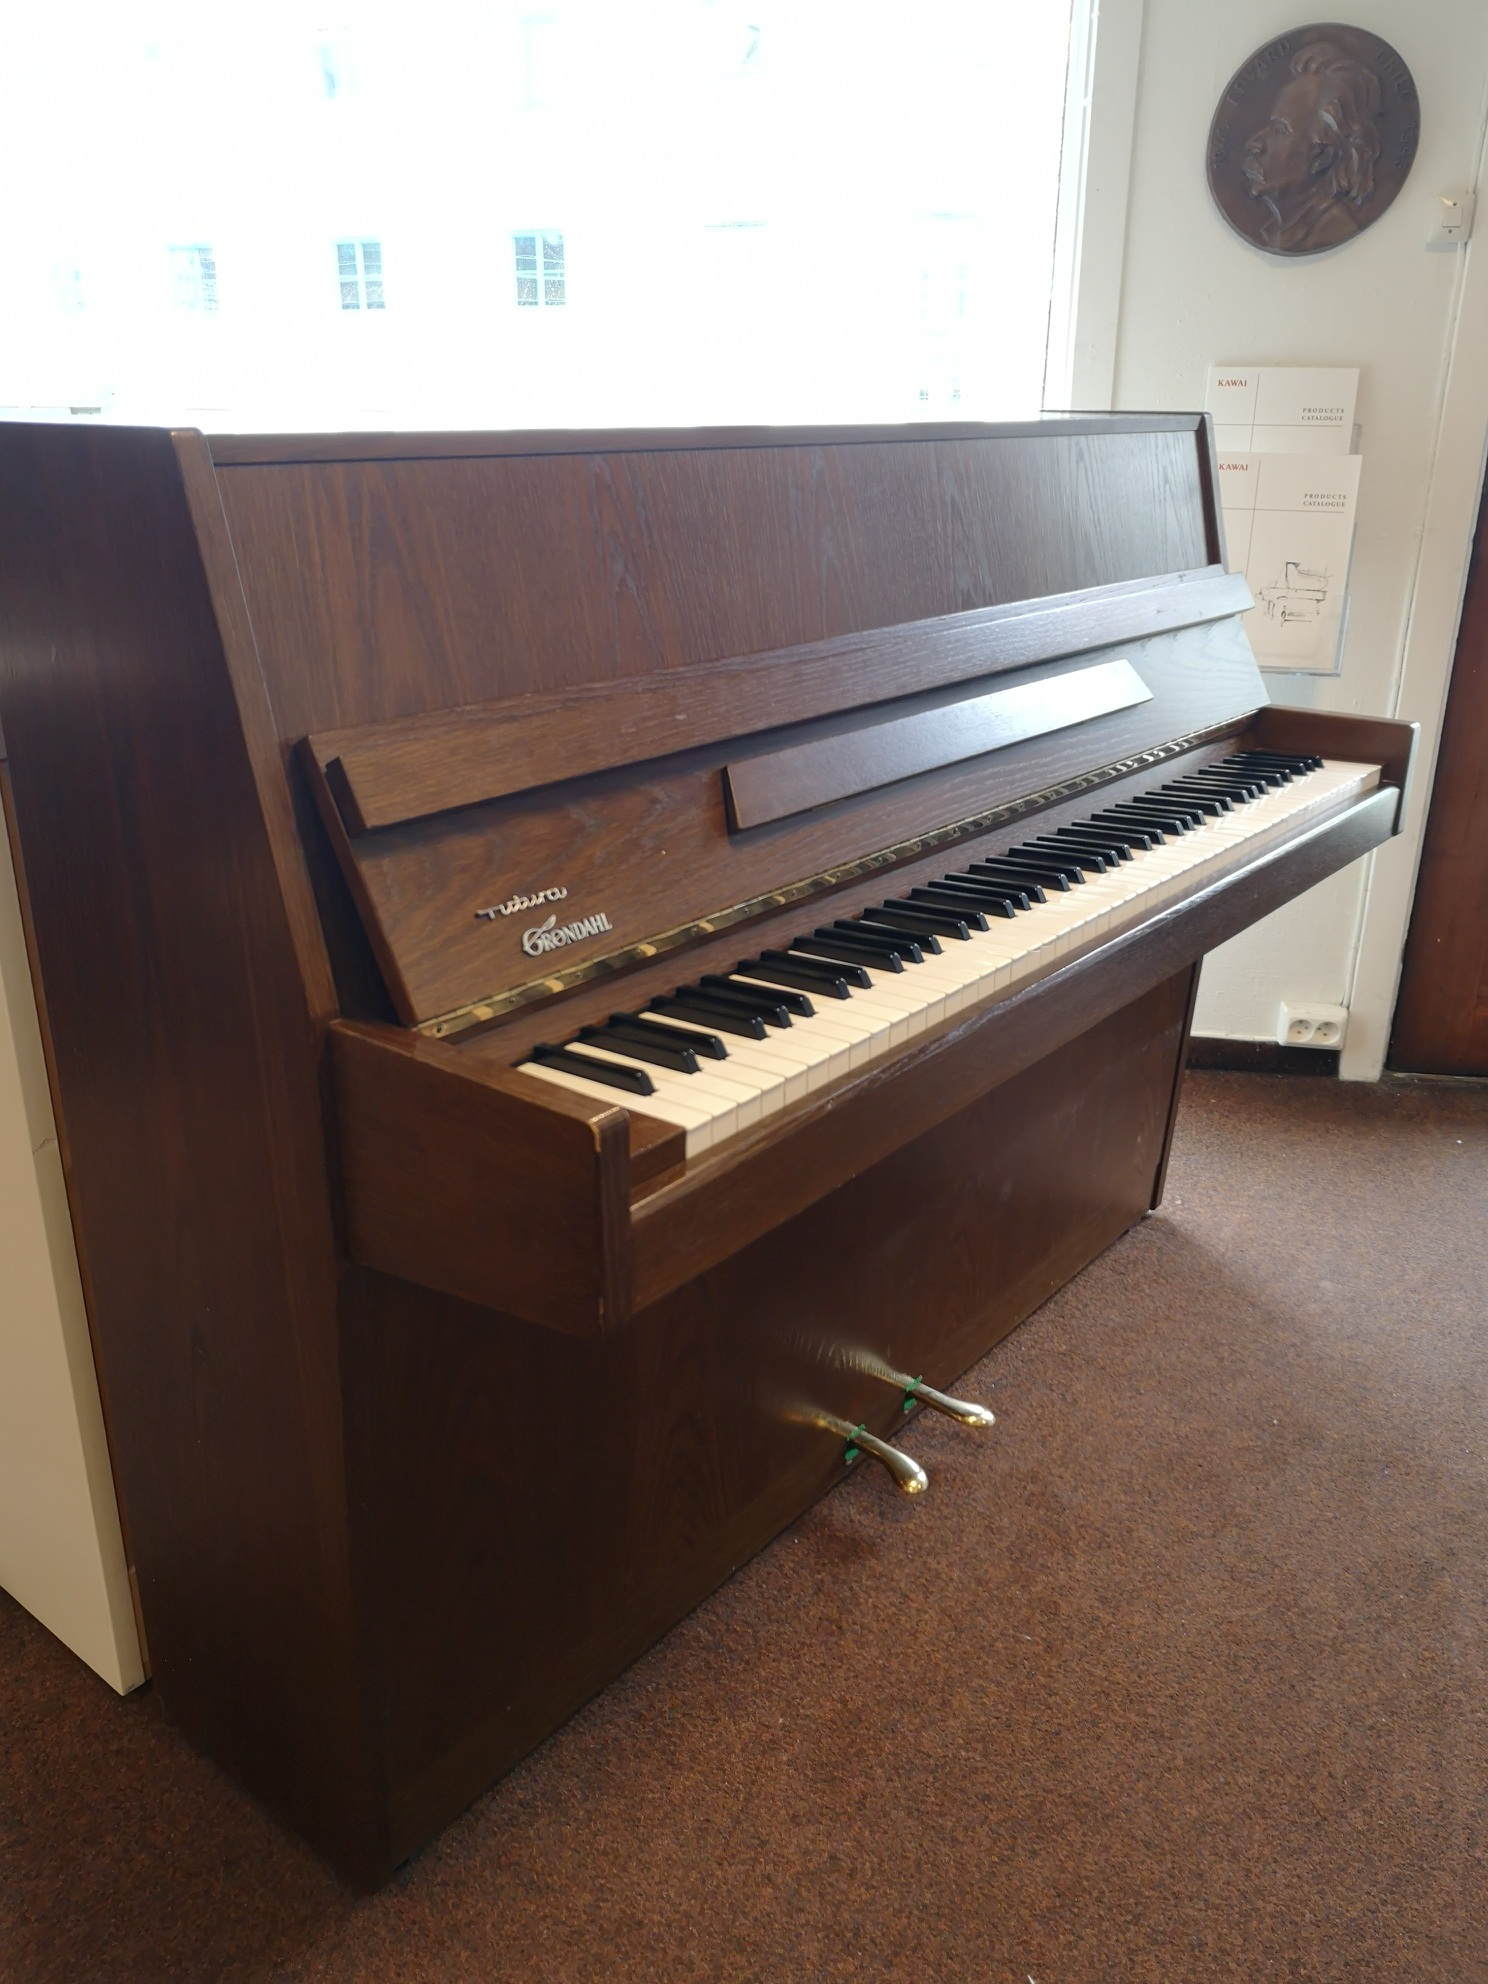 Lamper | Musikkhuset.no Henrik Eide AS Piano, Flygel